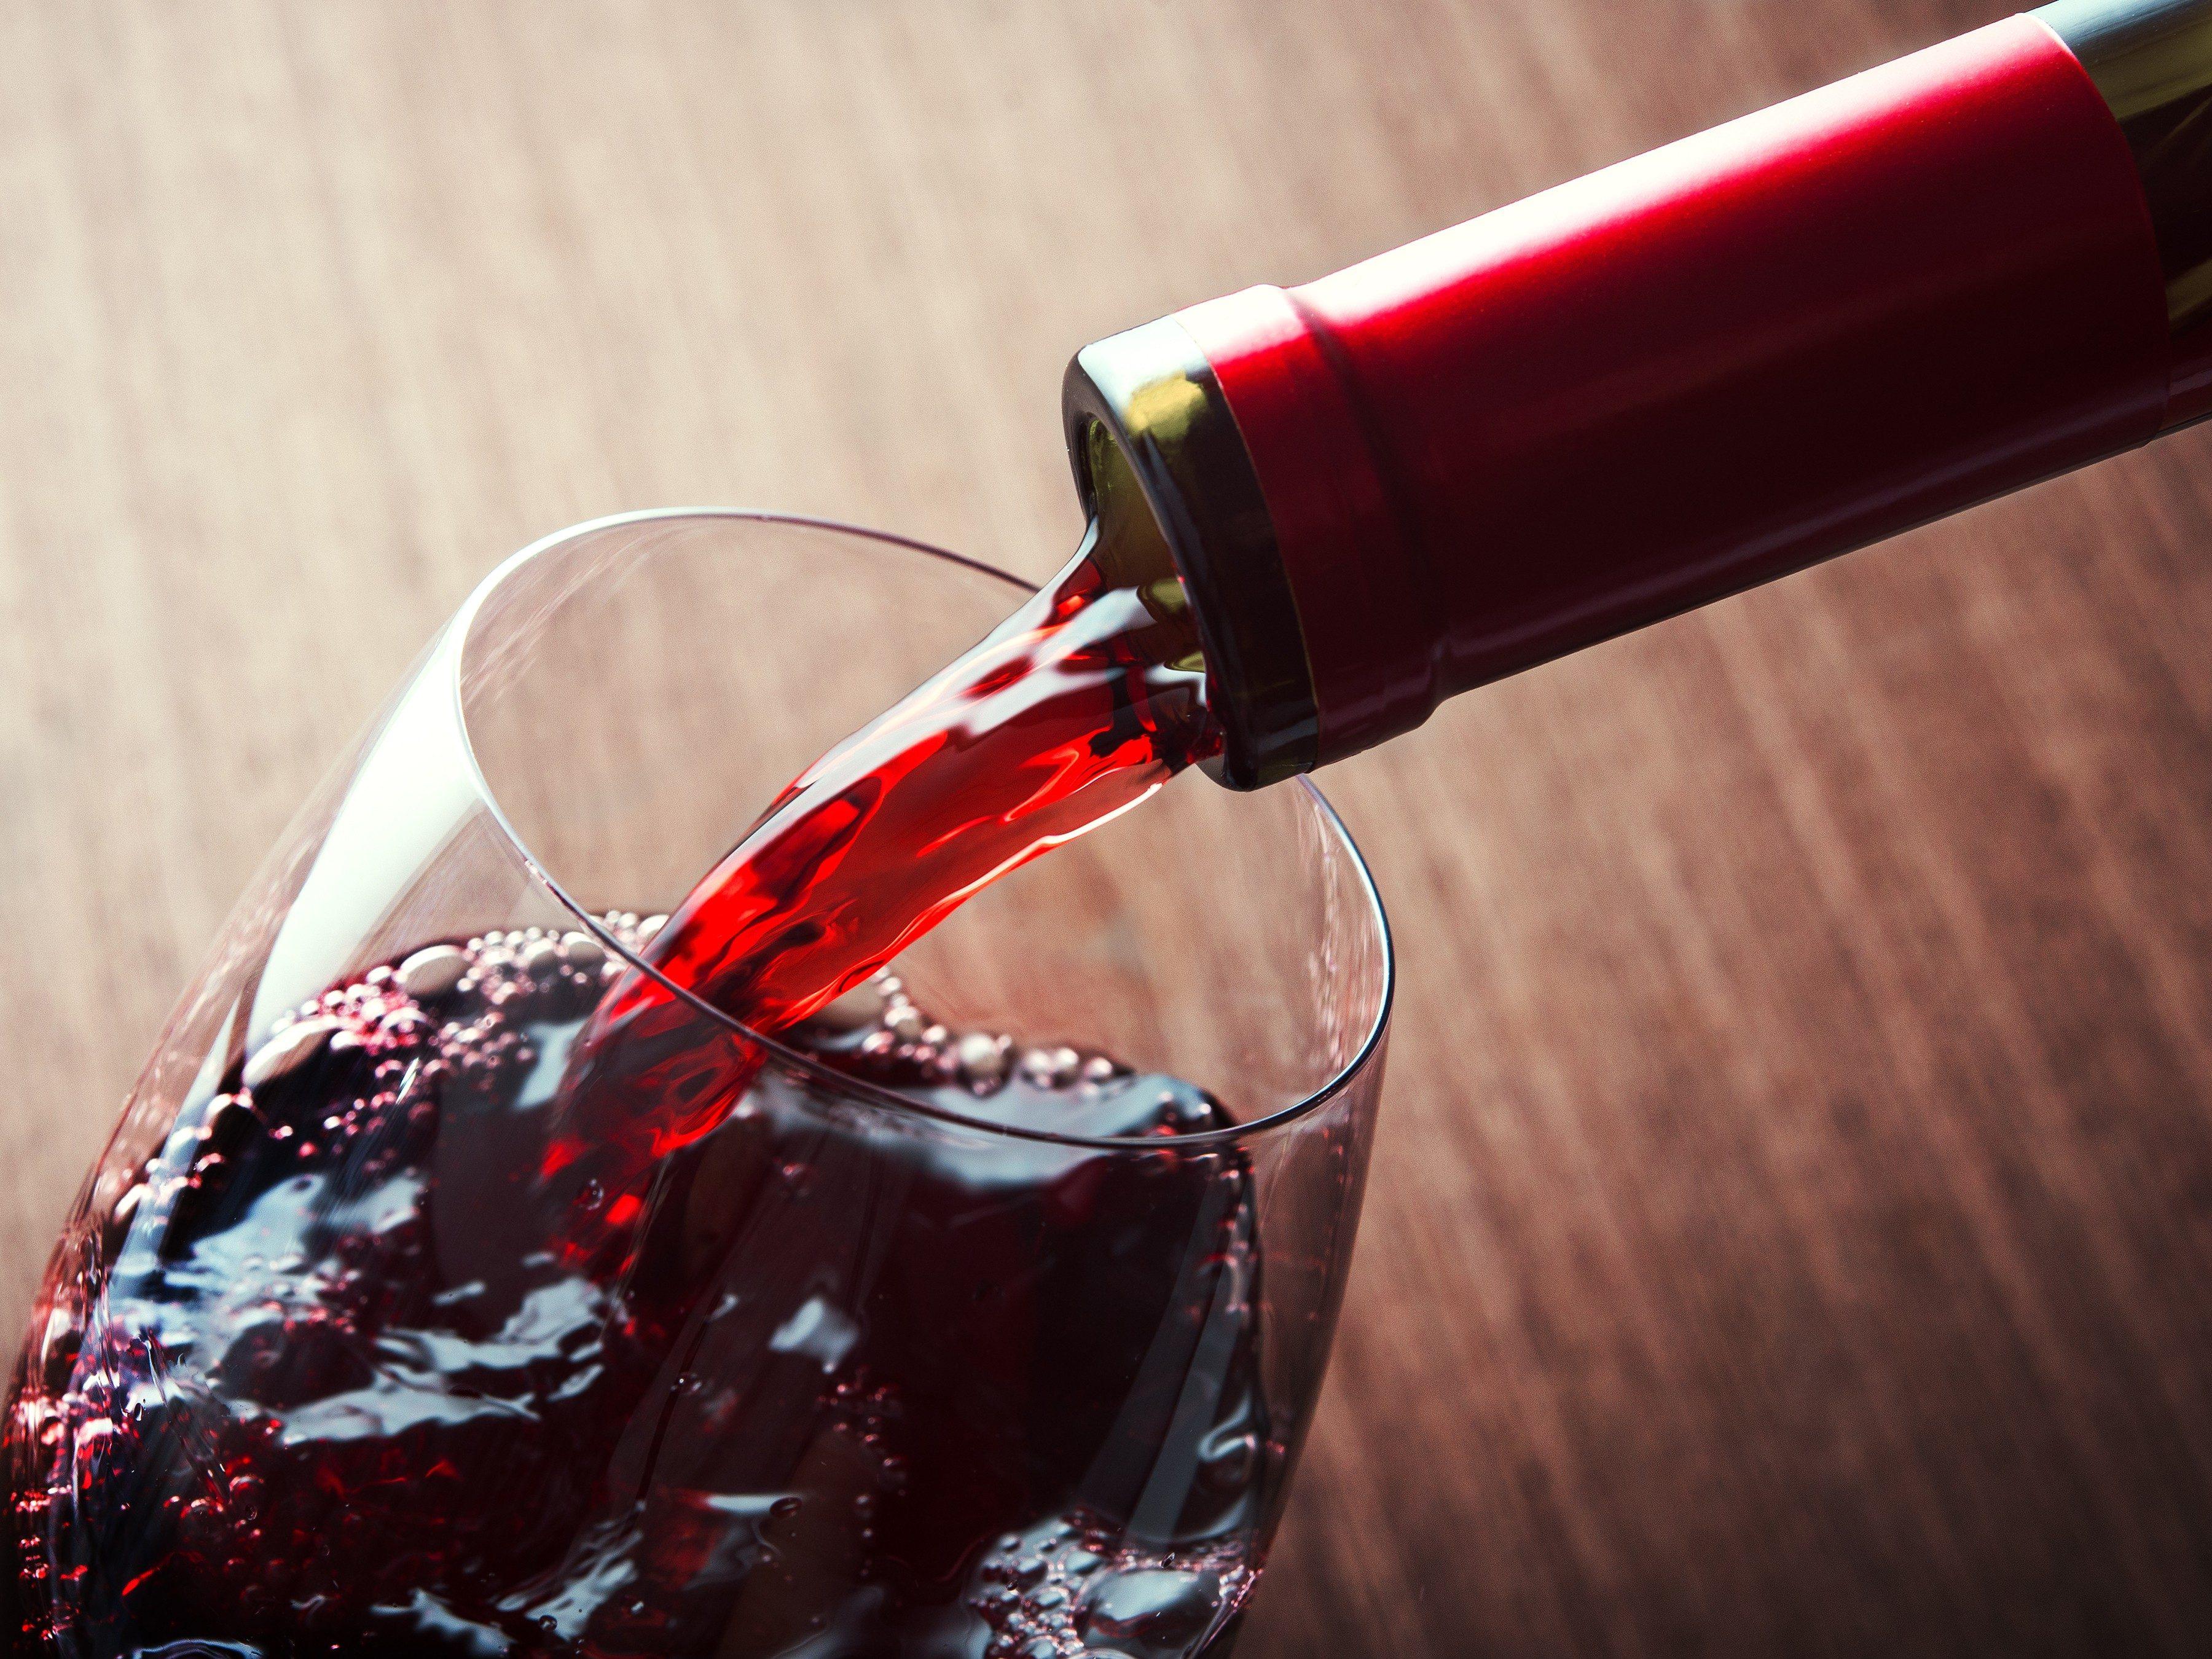 4. Avoid alcohol